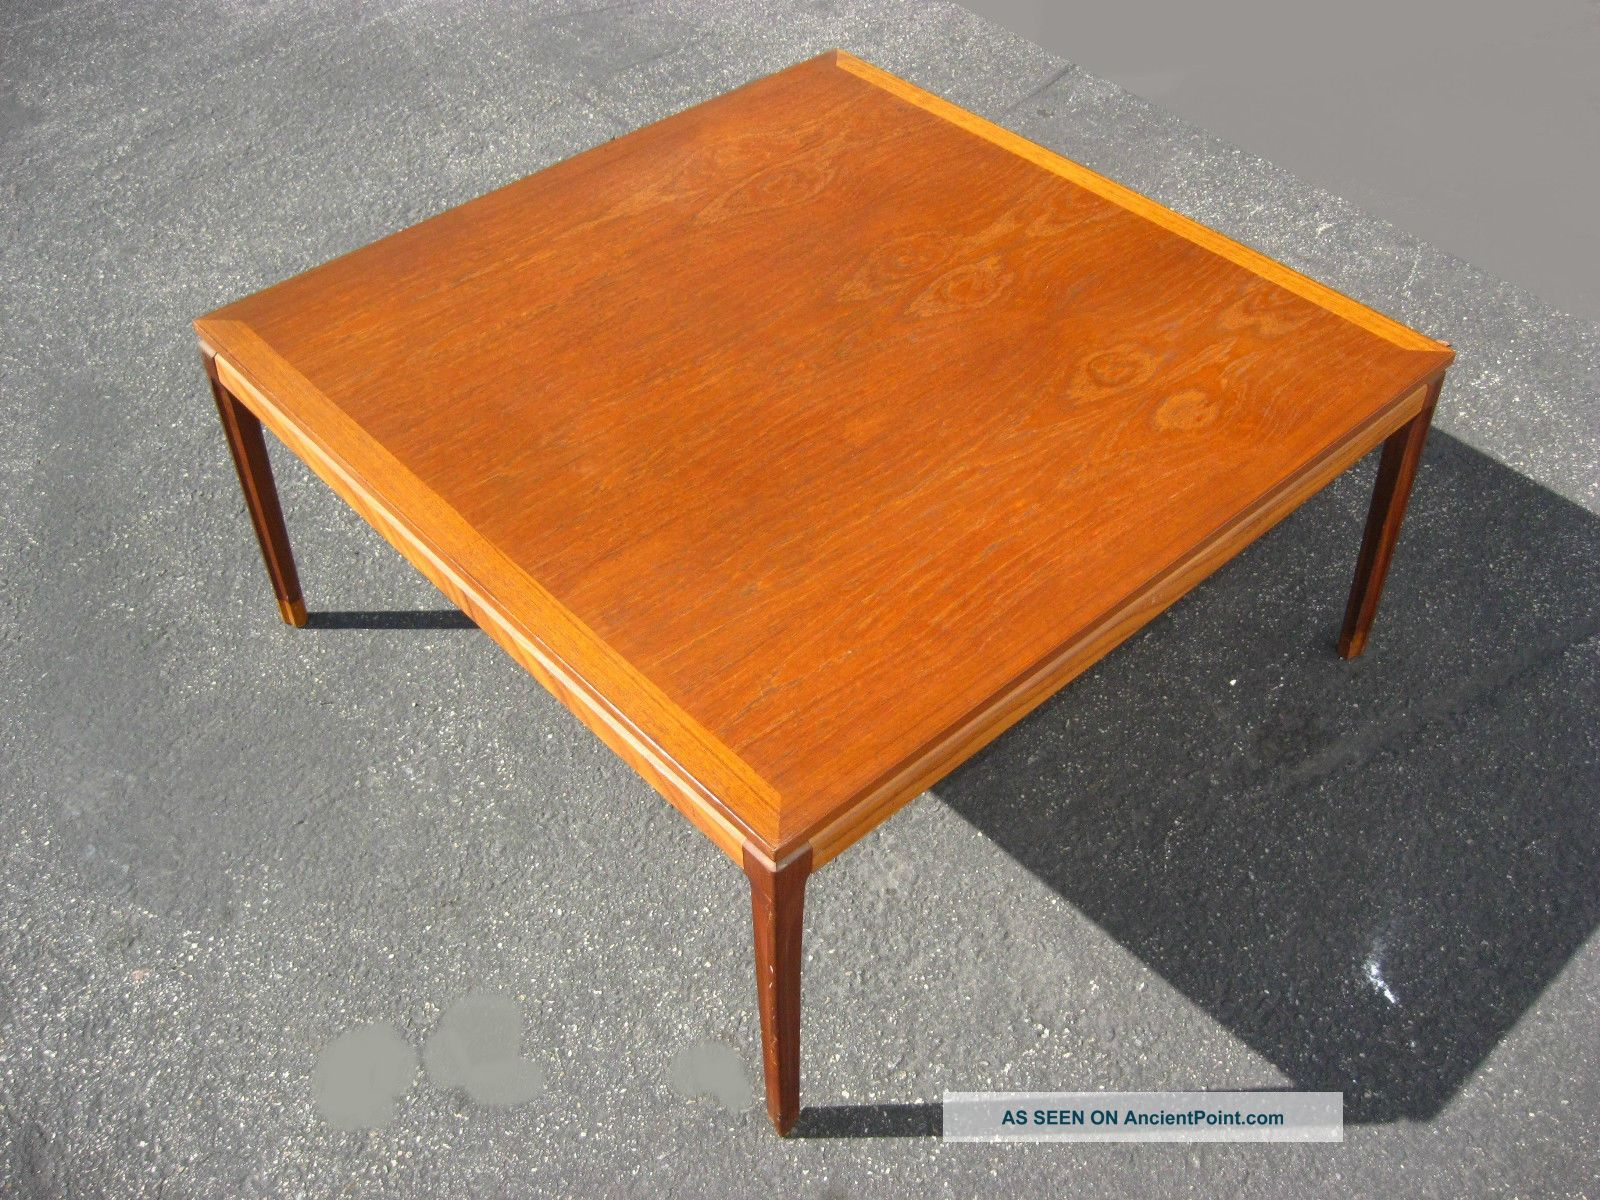 Large Vintage Made In Denmark Teak Wood Coffee Table Danish Mid Century  Modern